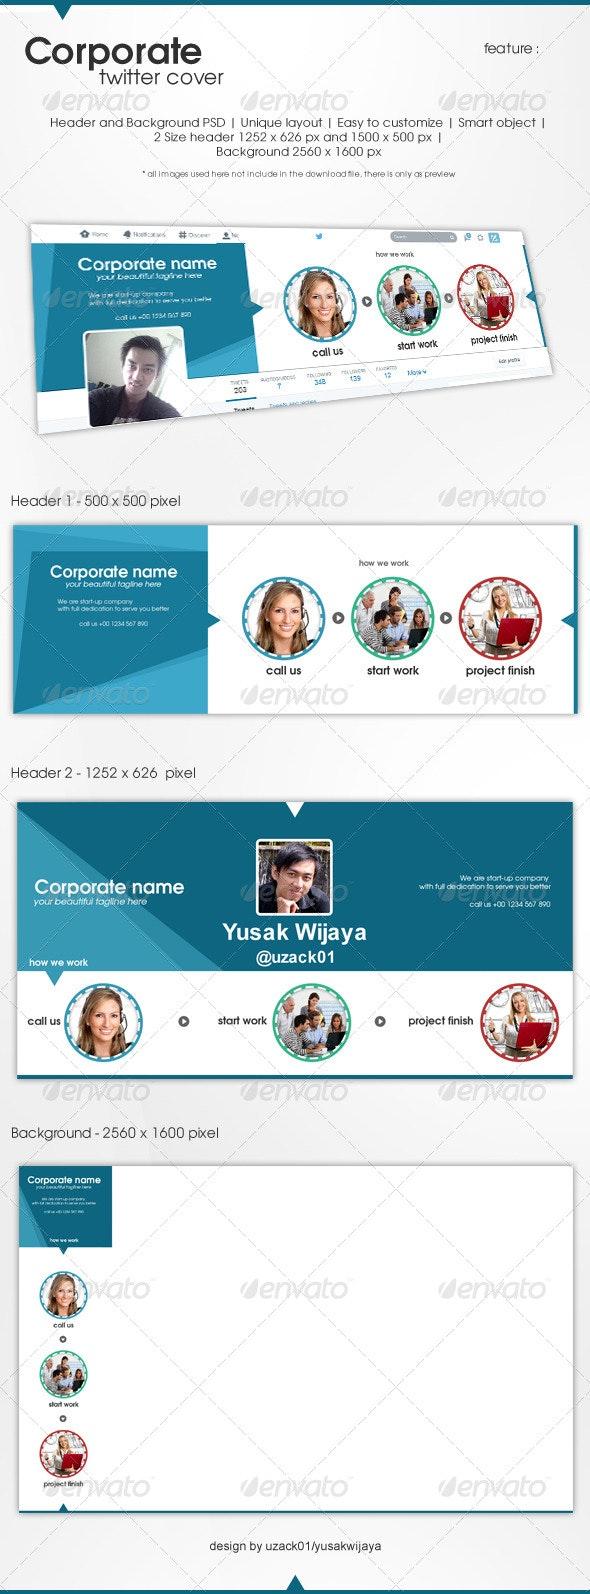 Corporate Twitter - Twitter Social Media